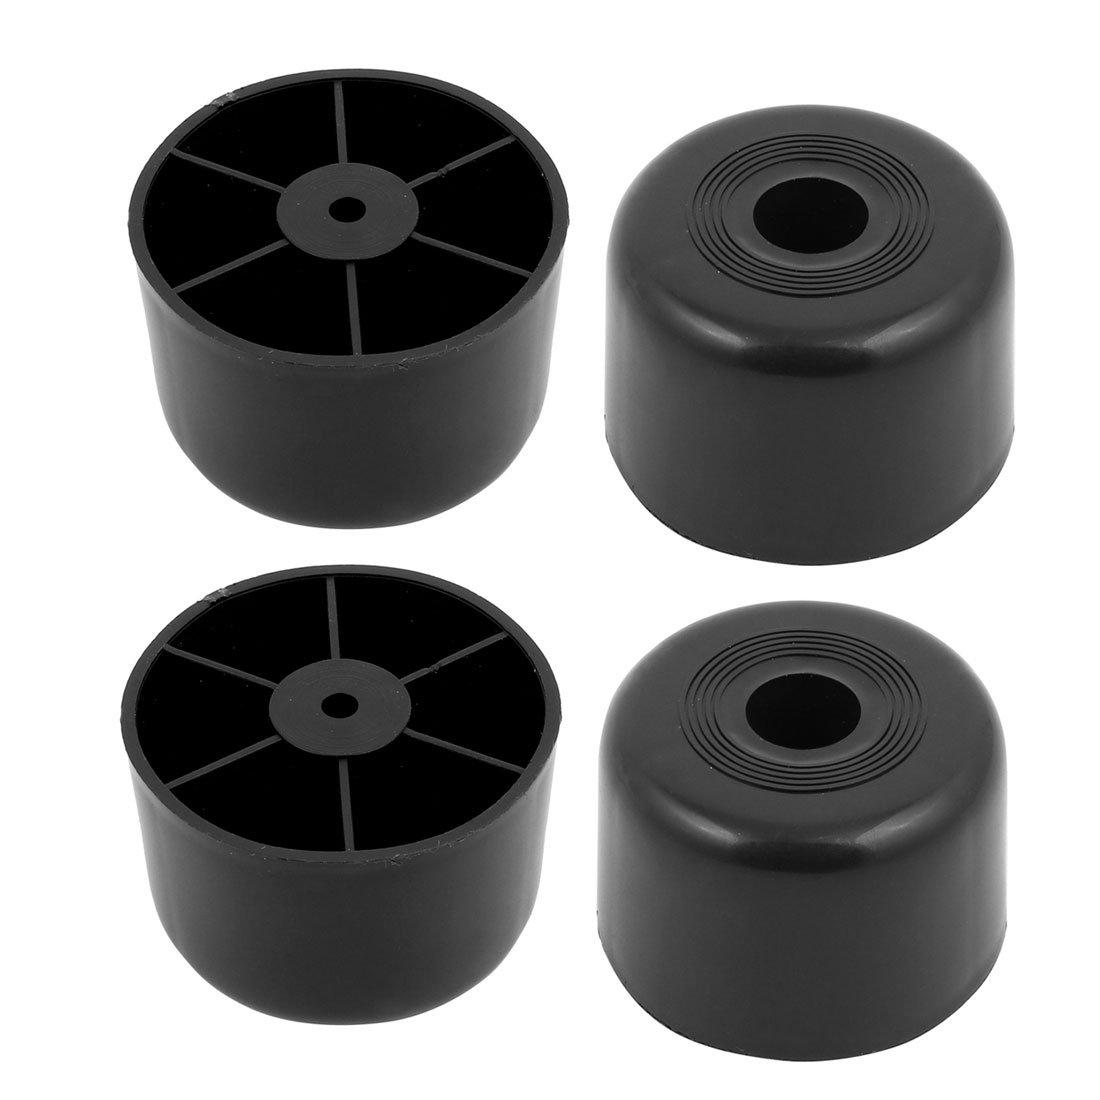 uxcell 4pcs 60mmx40mm Round Shaped Cabinet Sofa Leg Feet Black Plastic a17061700ux0654